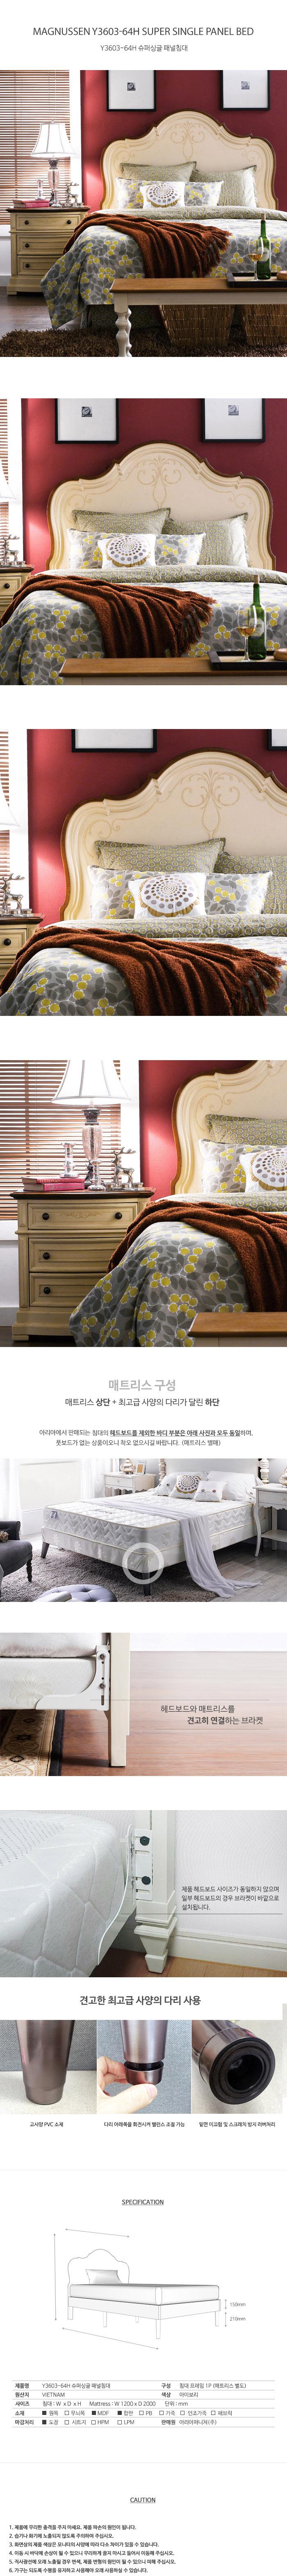 1_2_Macys_Headboard_Bed.jpg